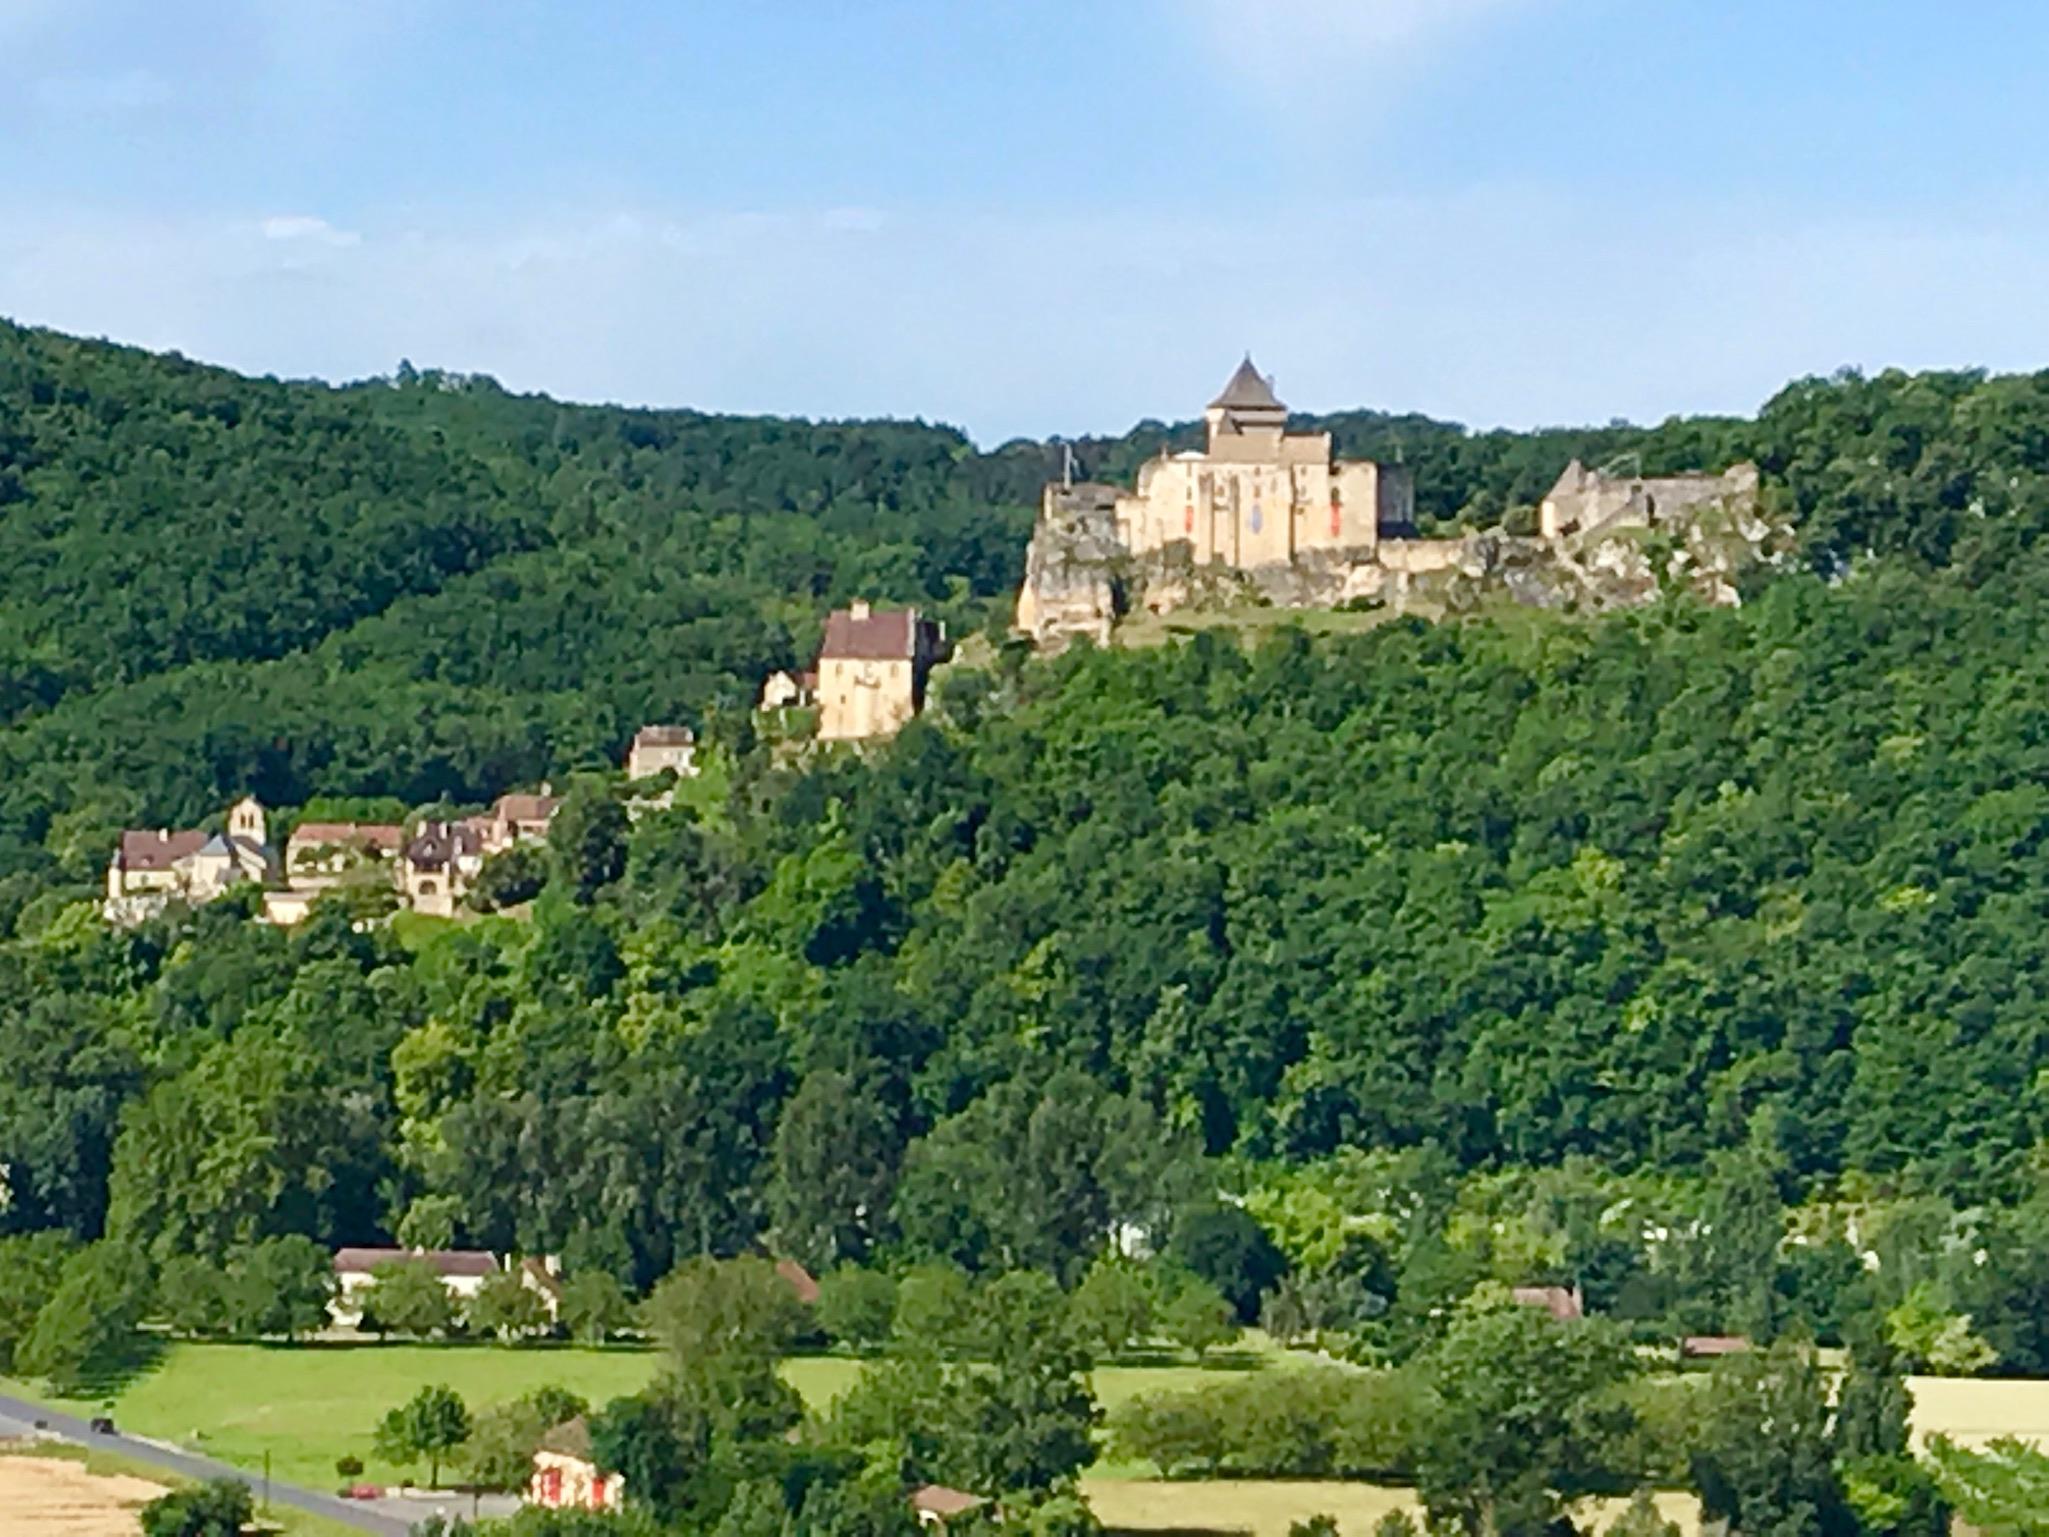 Castelnaud across the valley.